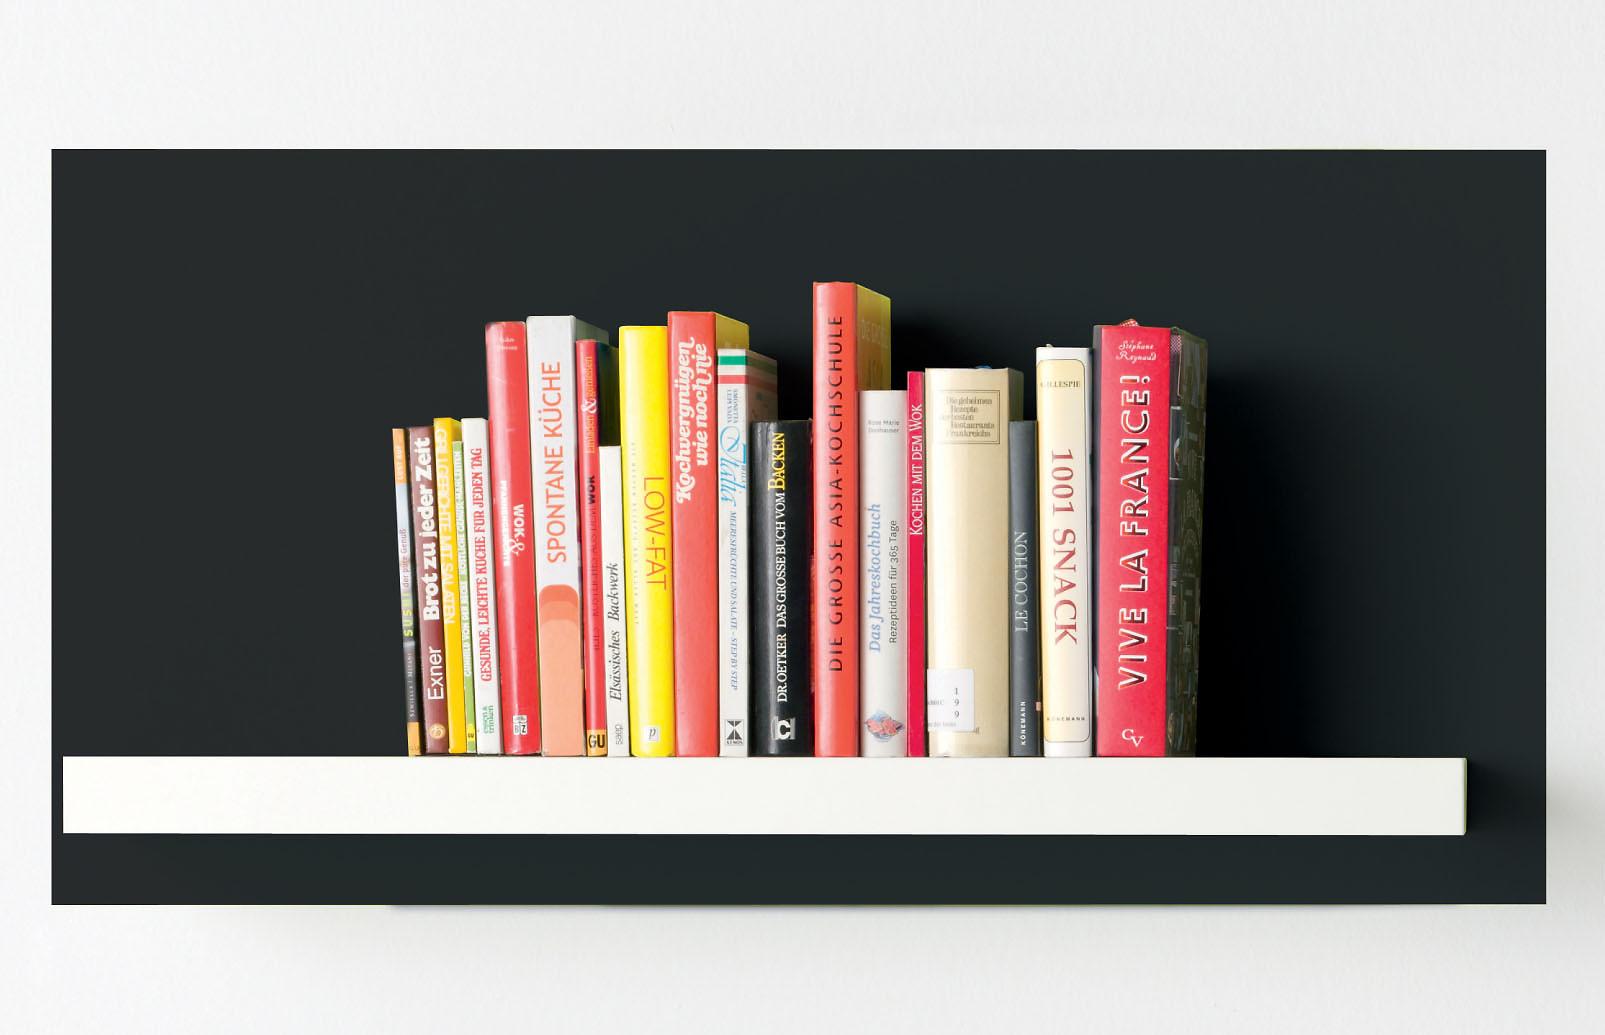 abt nfarbe farbe selber mischen schwarz alpina color night black alpina farben. Black Bedroom Furniture Sets. Home Design Ideas